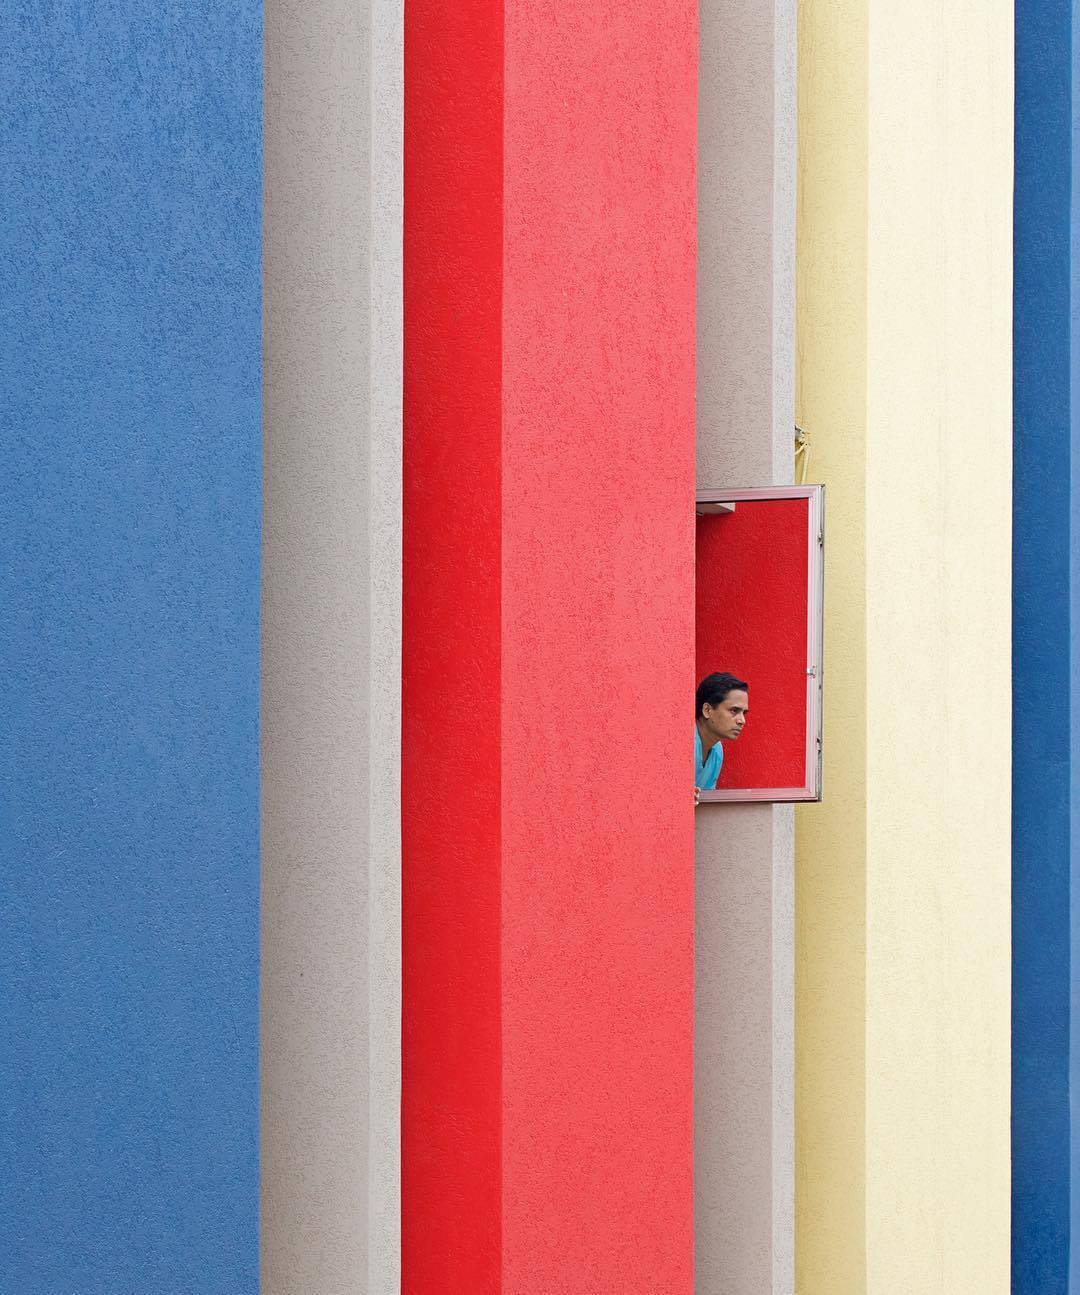 rgb_creative_ideas_design_photography_architecture_Serge_Najjar_03